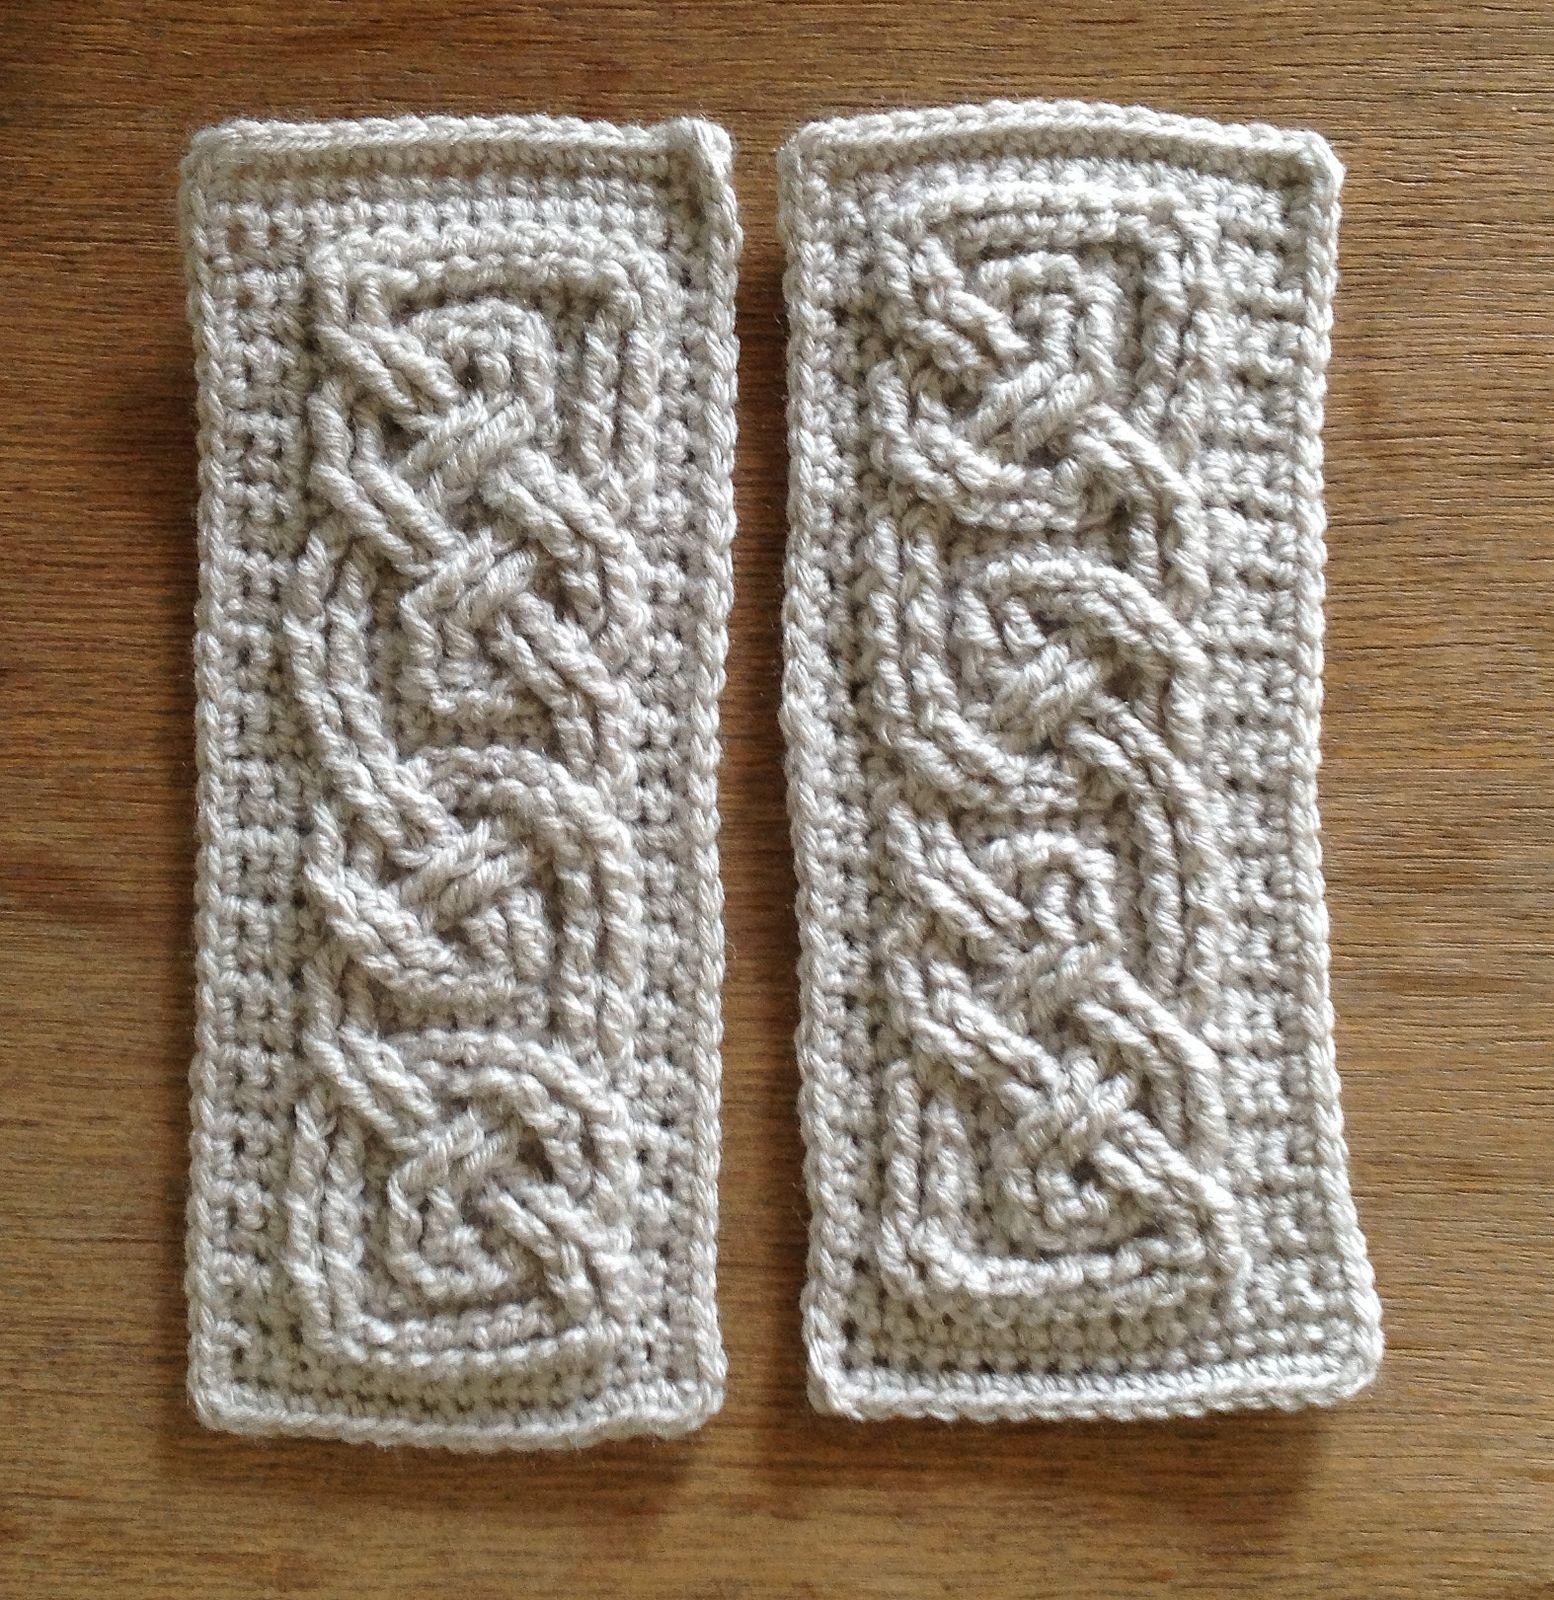 Suvi's Crochet: Book Of Kells  Small Celtic Cables